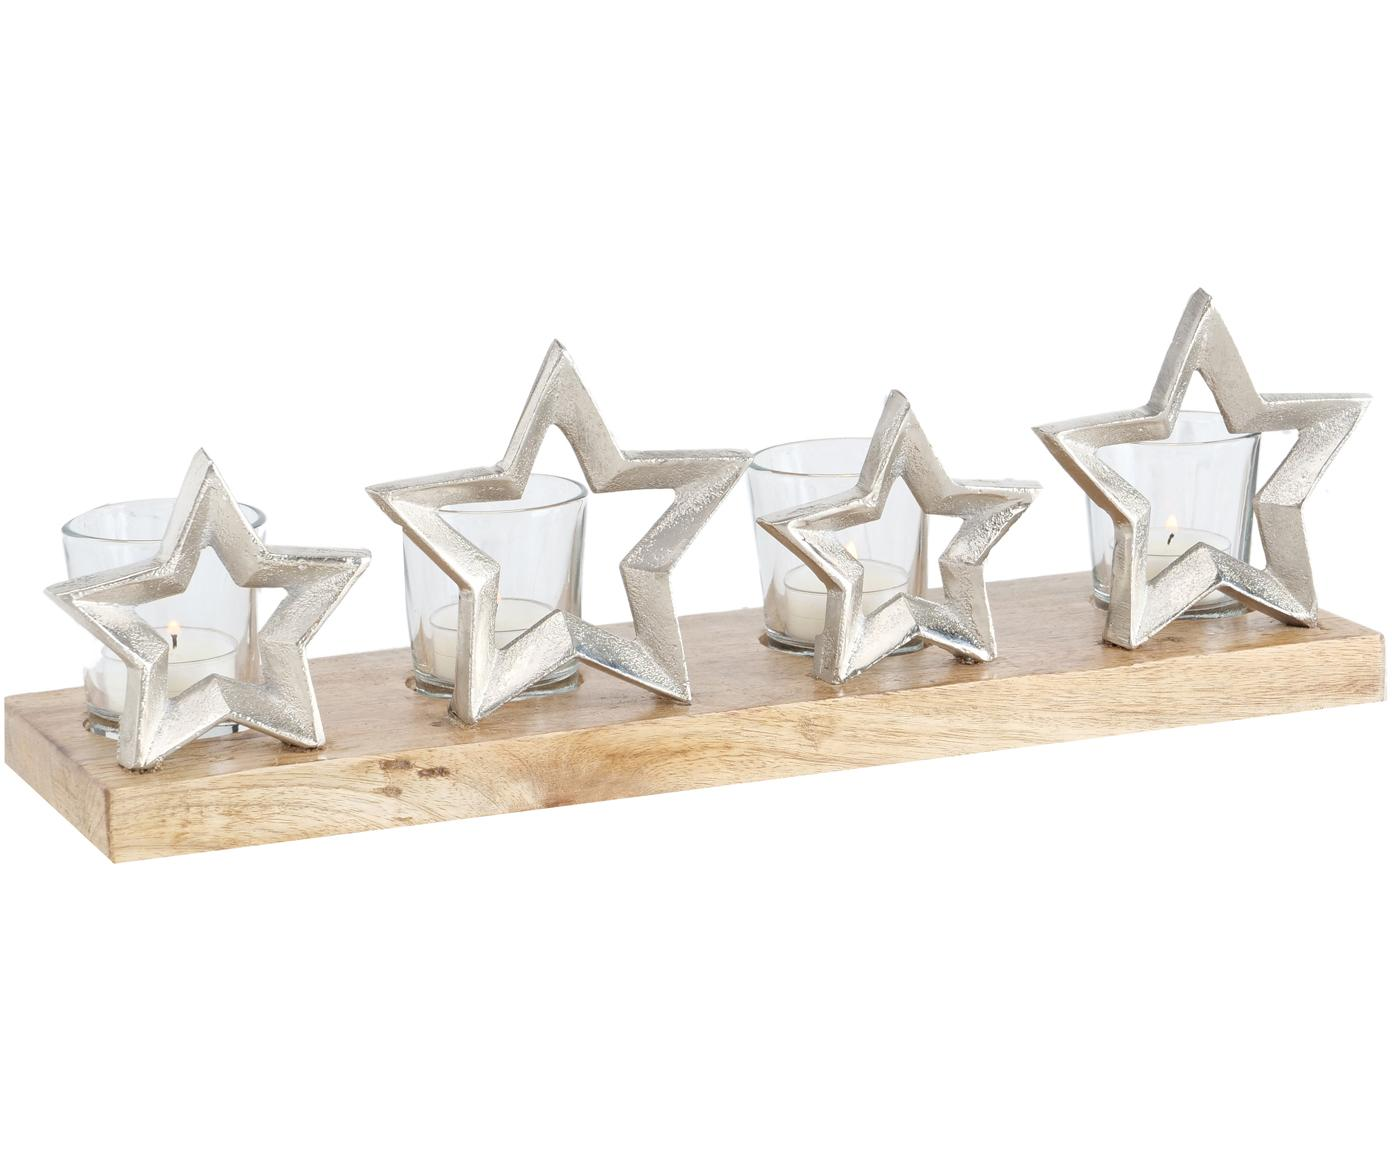 Set 5 portalumini Janna, Vassoio: legno di mango, alluminio, Portacandela: vetro, Legno di mango, alluminio, trasparente, Larg. 42 x Alt. 14 cm